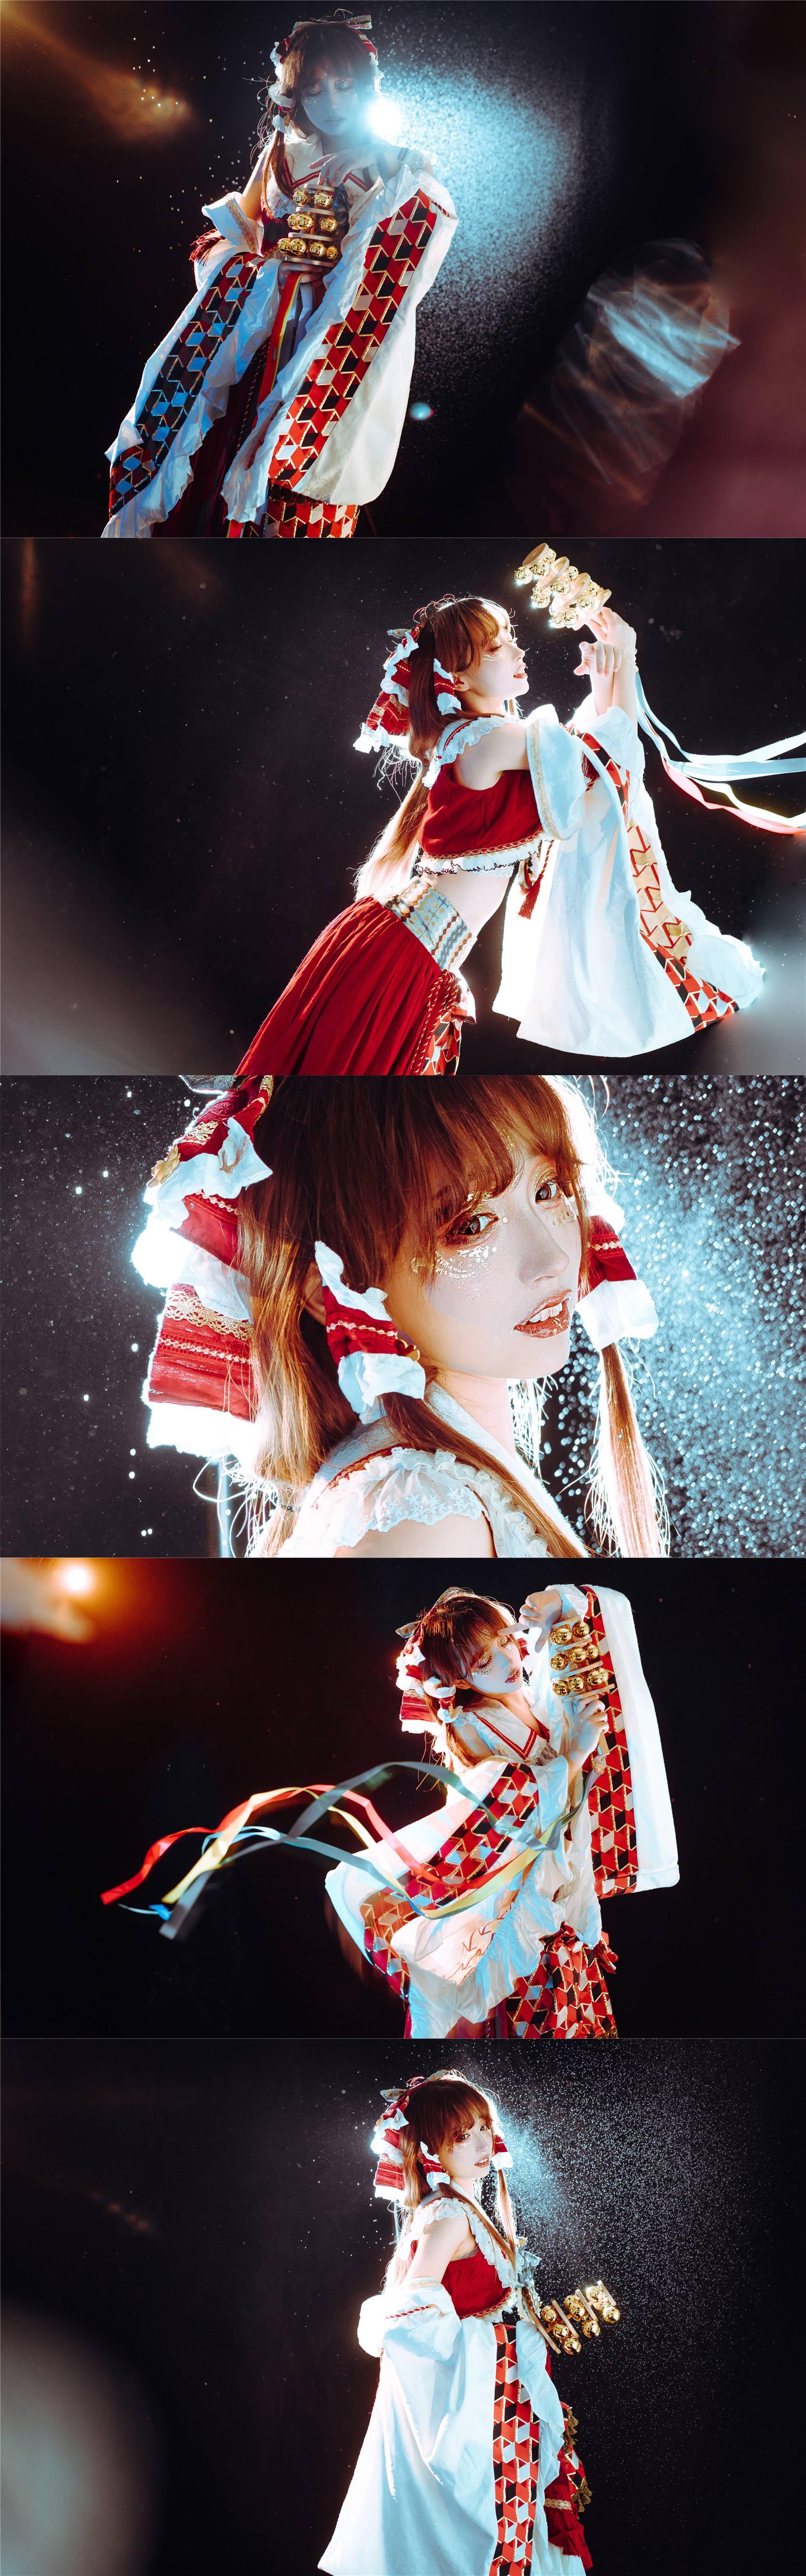 《东方PROJECT》博丽灵梦cosplay【CN:梨梨起床啊】-第3张